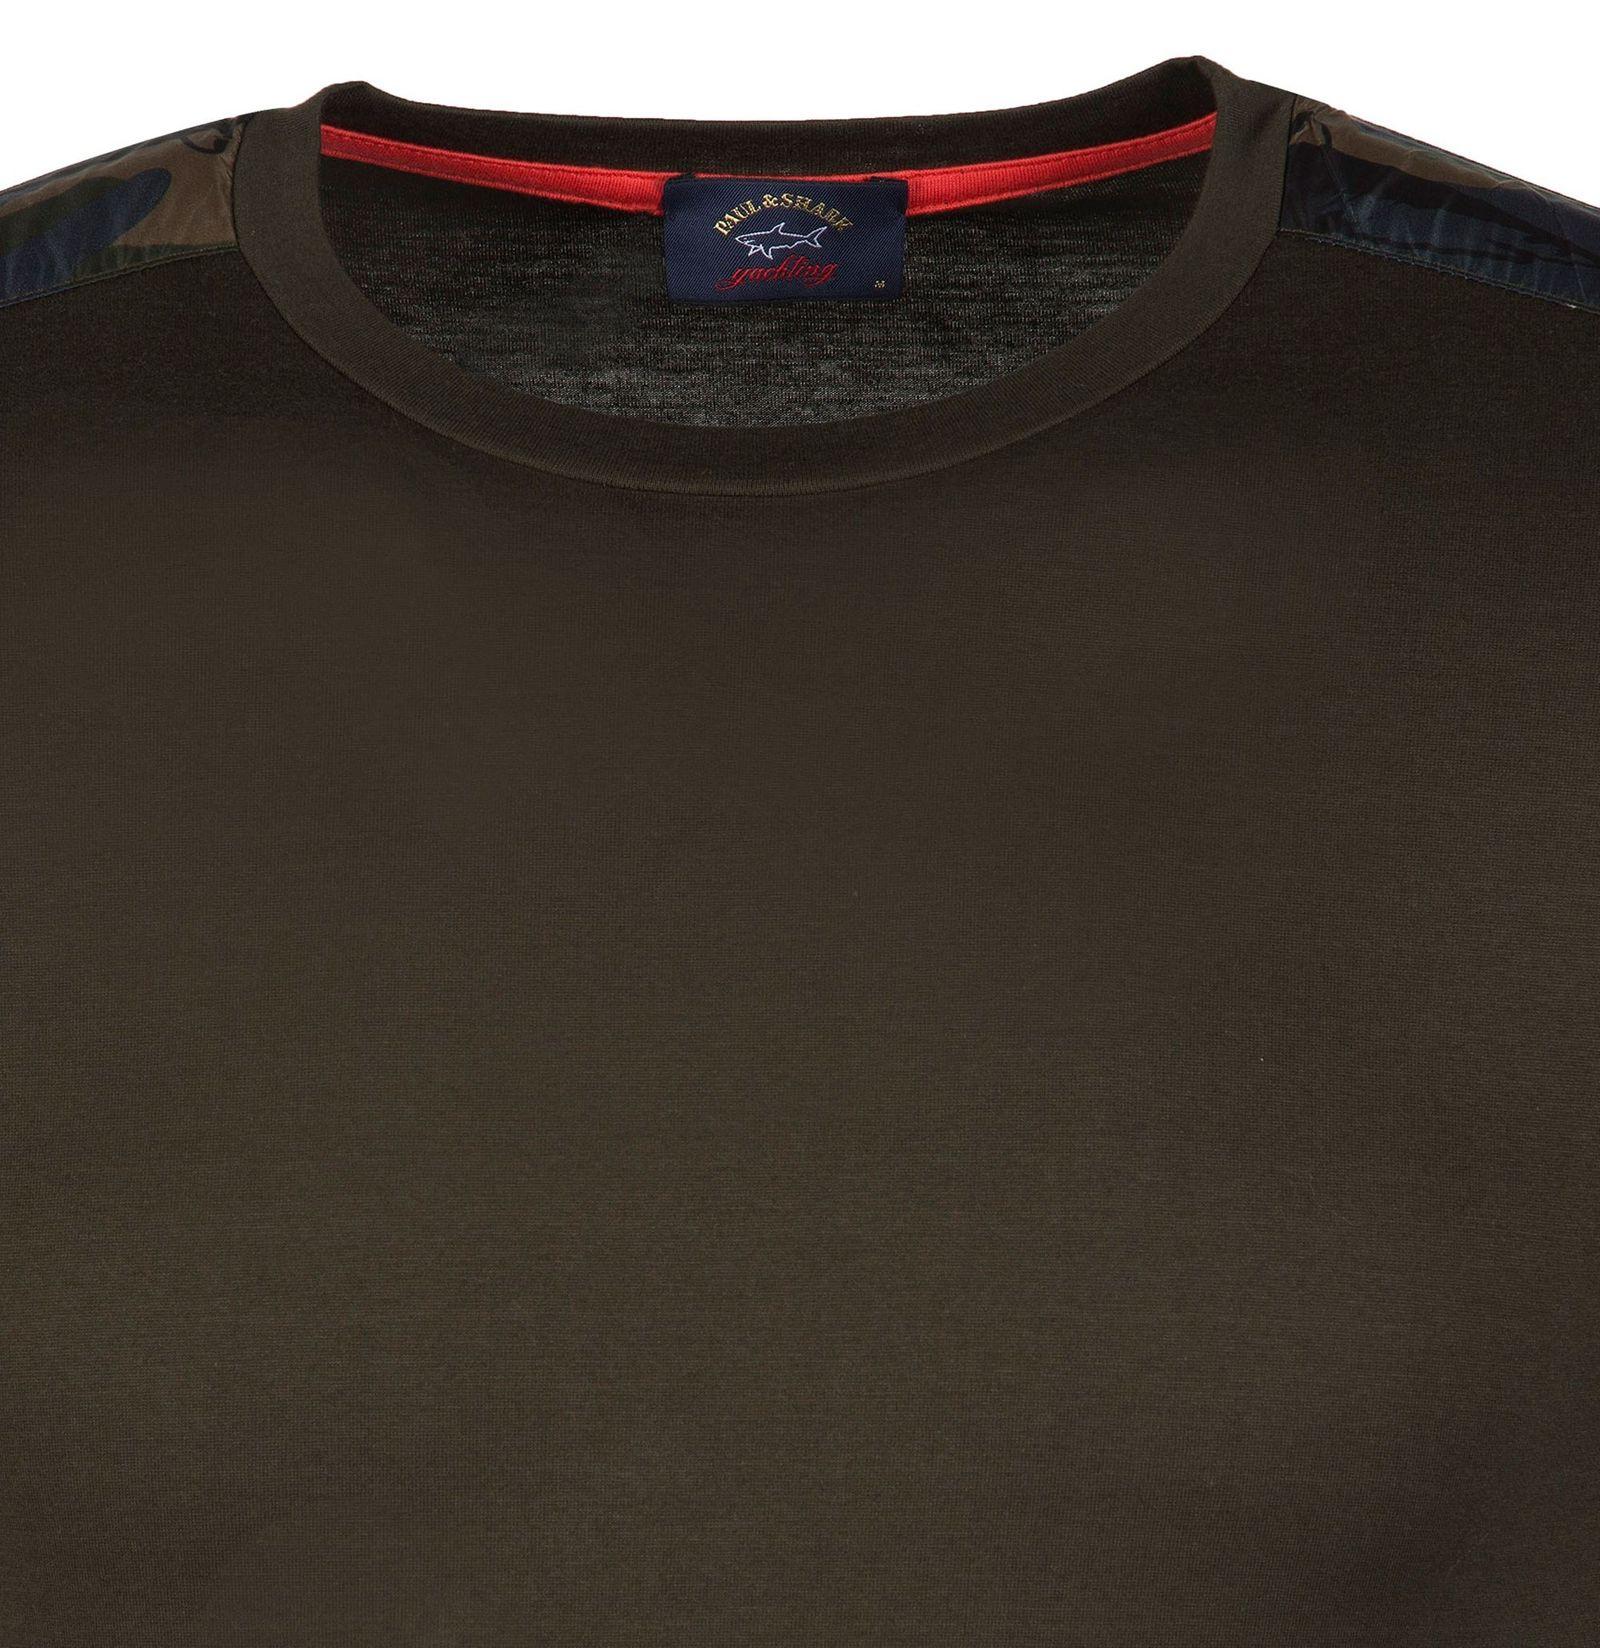 تی شرت نخی یقه گرد مردانه - پاول اند شارک - زيتوني تيره - 3